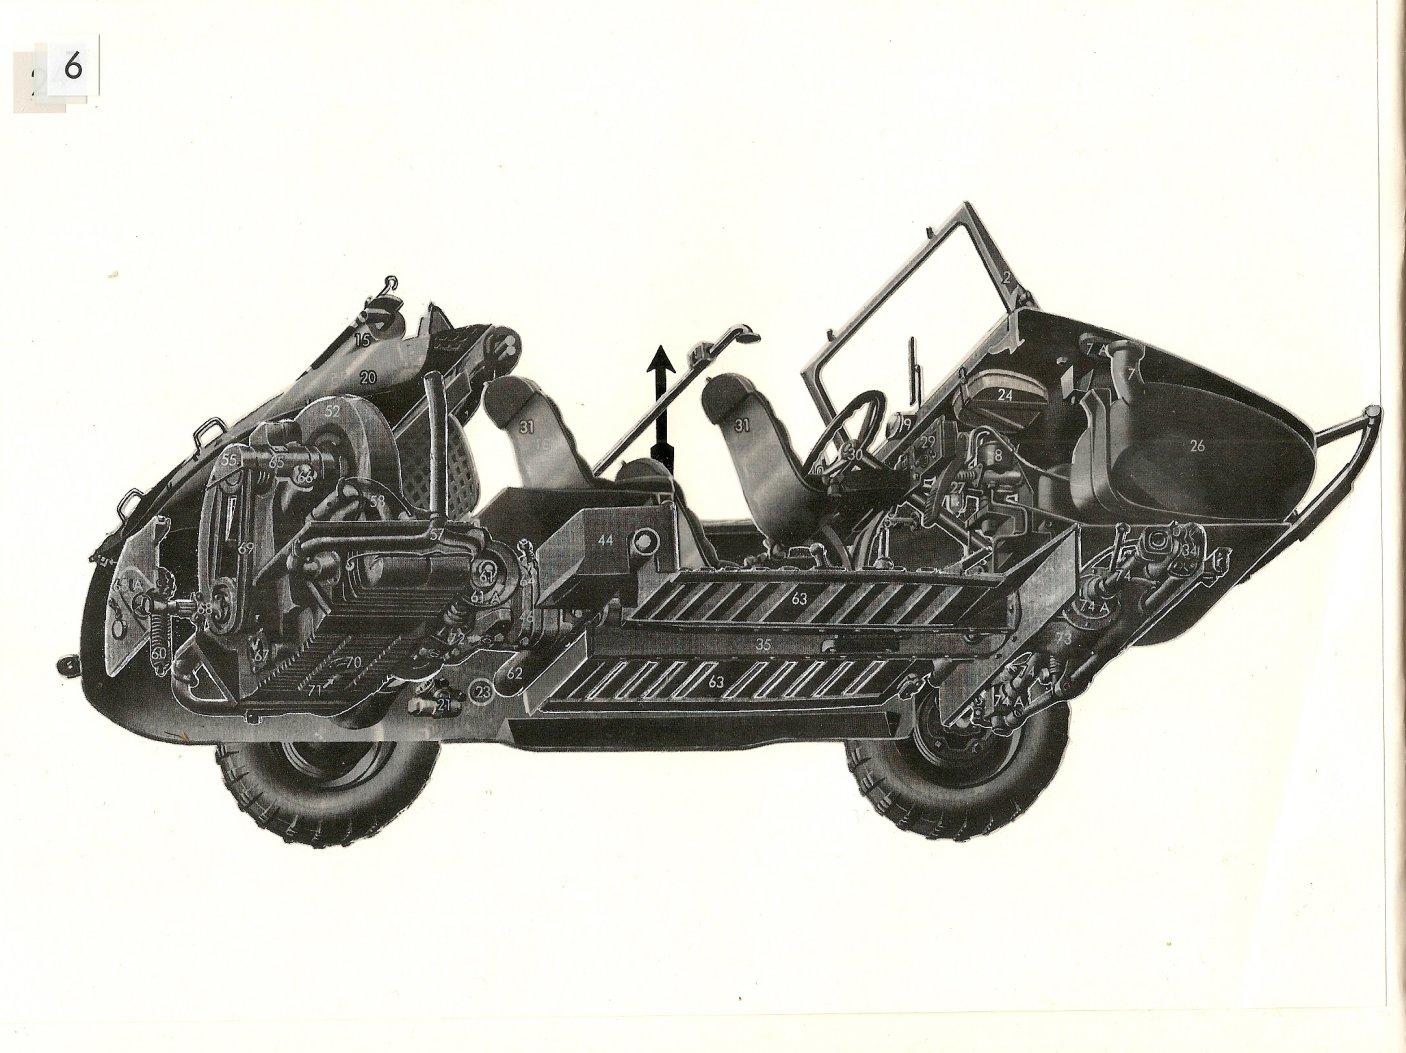 Thesamba Com Vw Archives 1942 Schwimmwagen Type 166 Brochure German